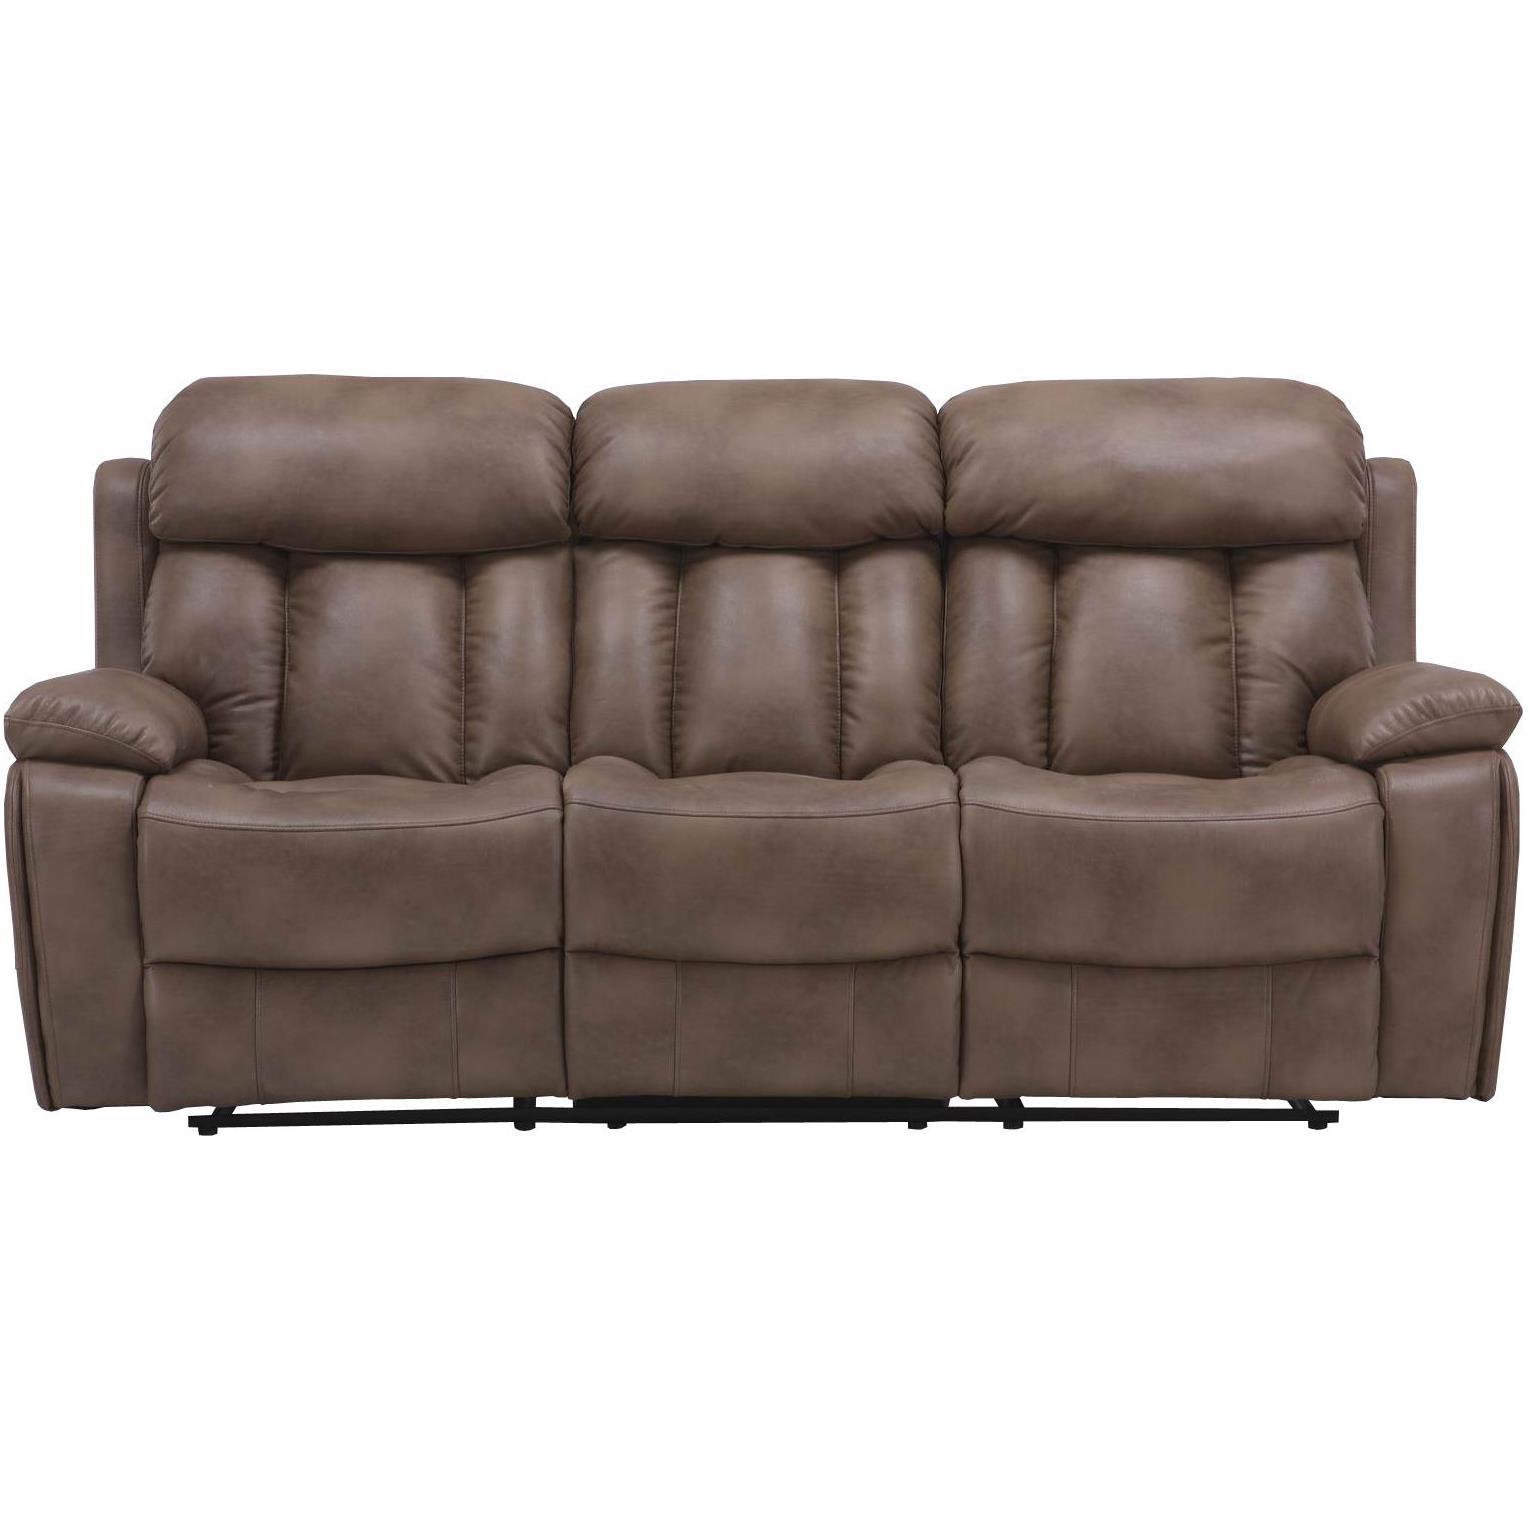 Parker Living Baron Casual Reclining Sofa - Item Number: MBAR-832-BA